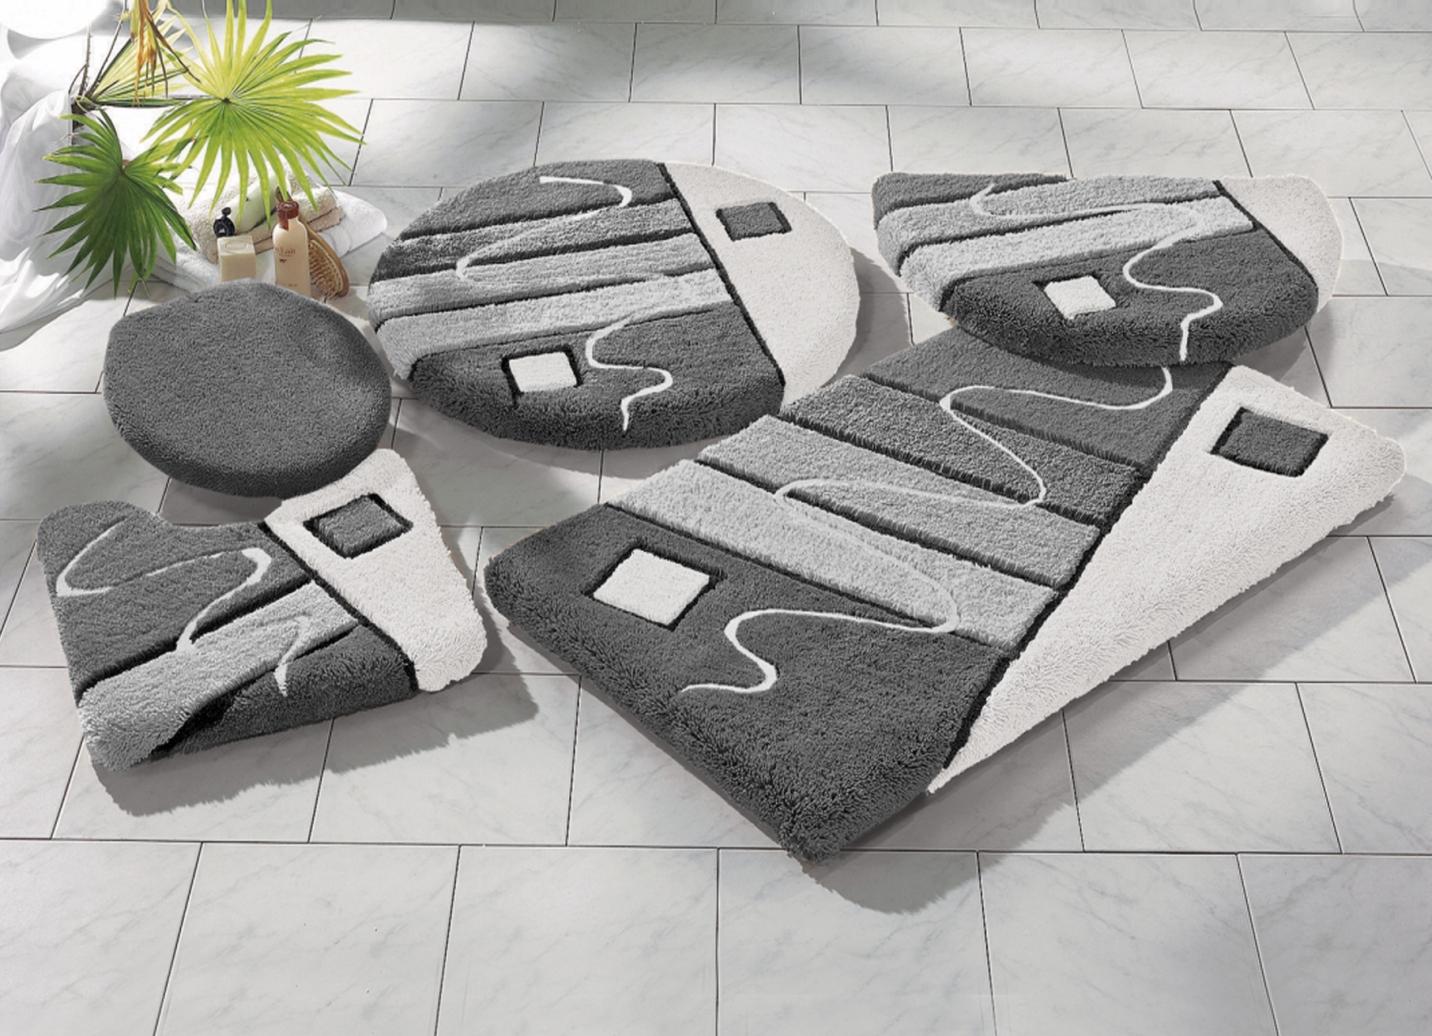 badezimmergarnitur 3 teilig | vitaplaza, Badezimmer ideen